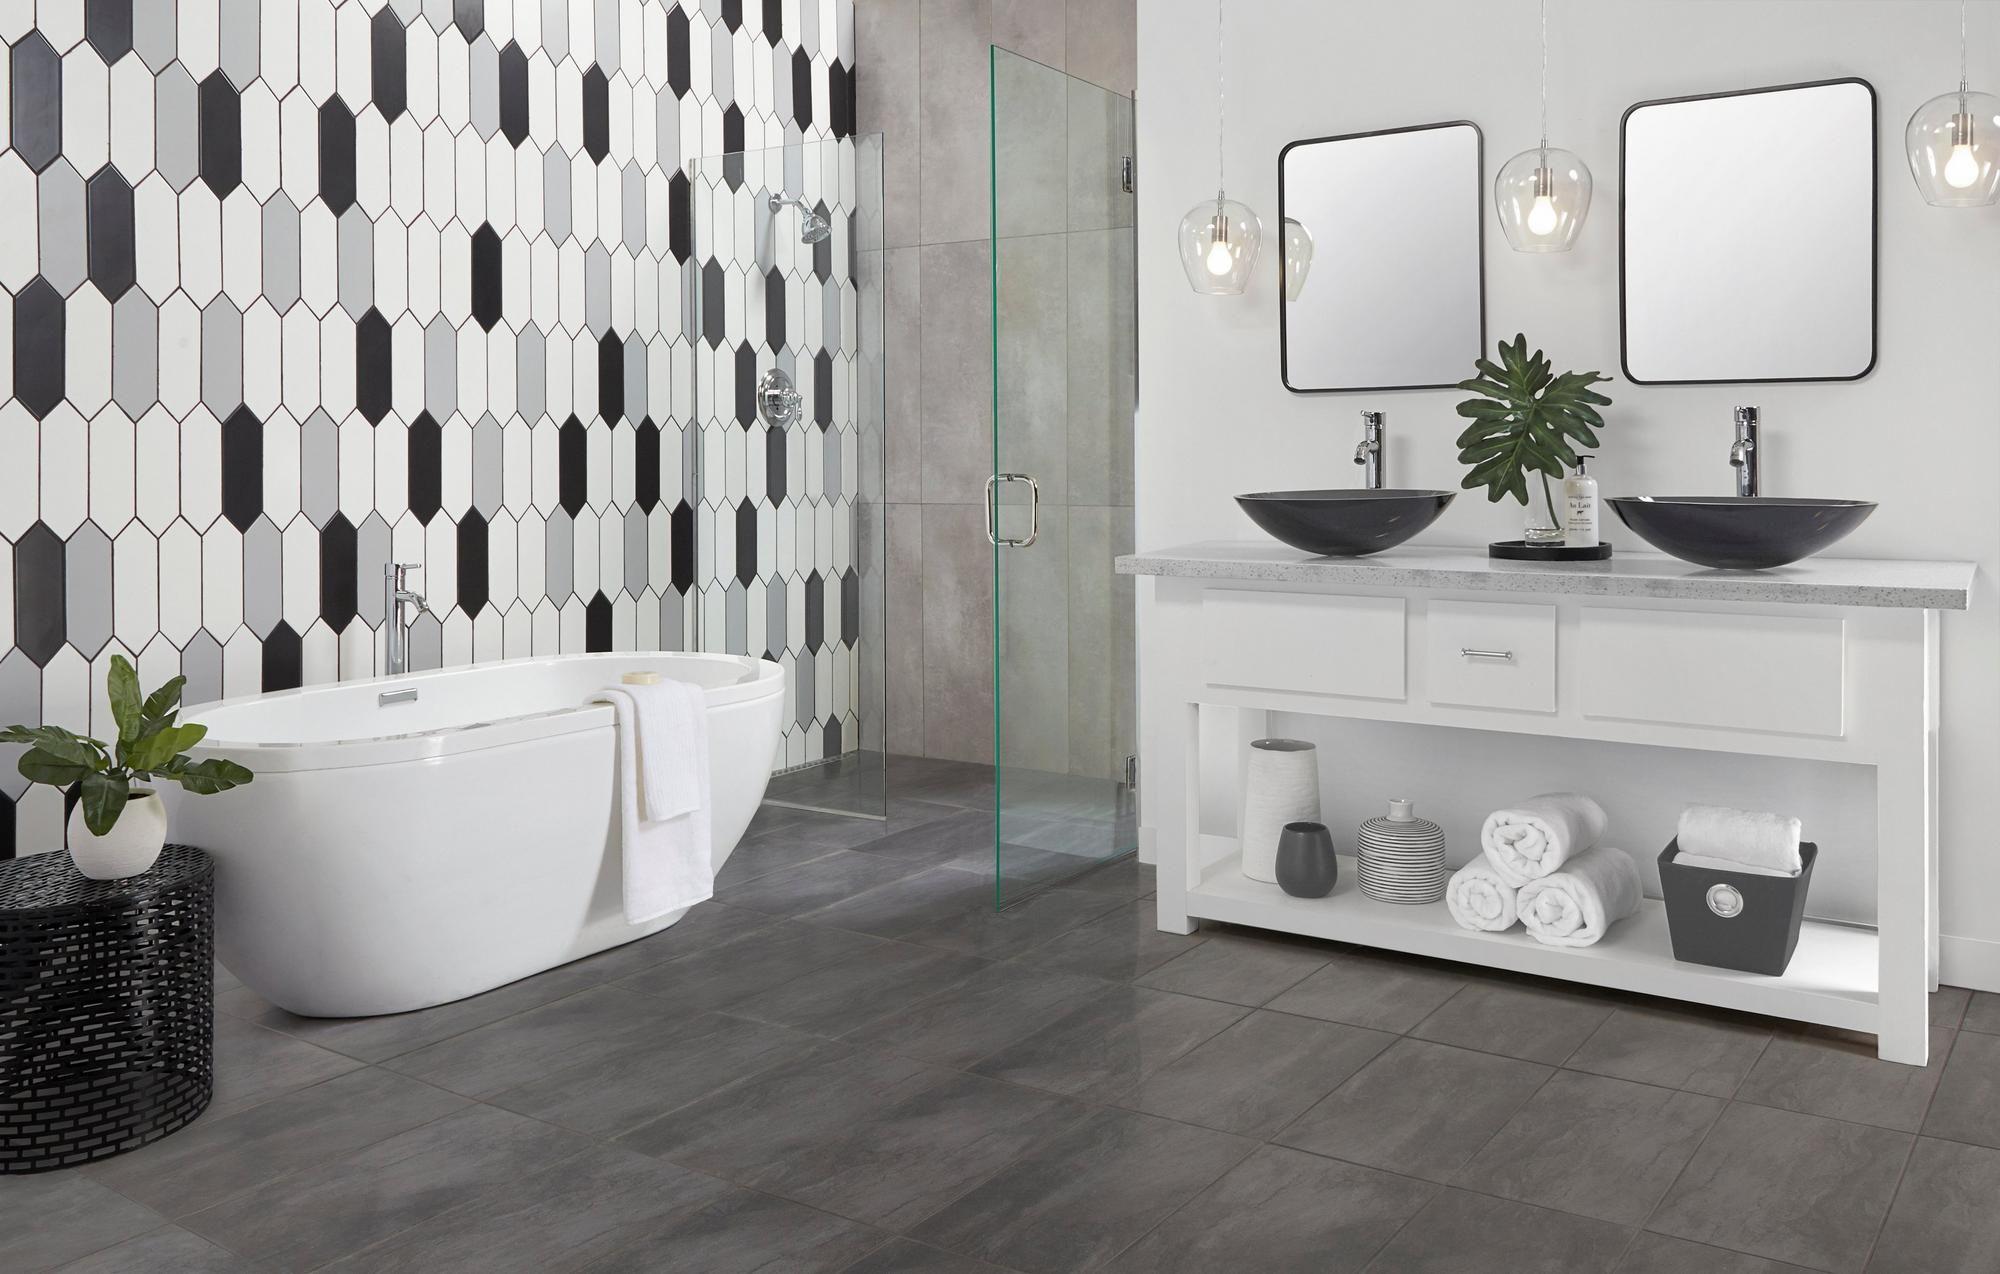 Costa Bella Nero Porcelain Tile Floor Decor In 2020 Floor Decor Grey Ceramic Tile Porcelain Tile Bathroom